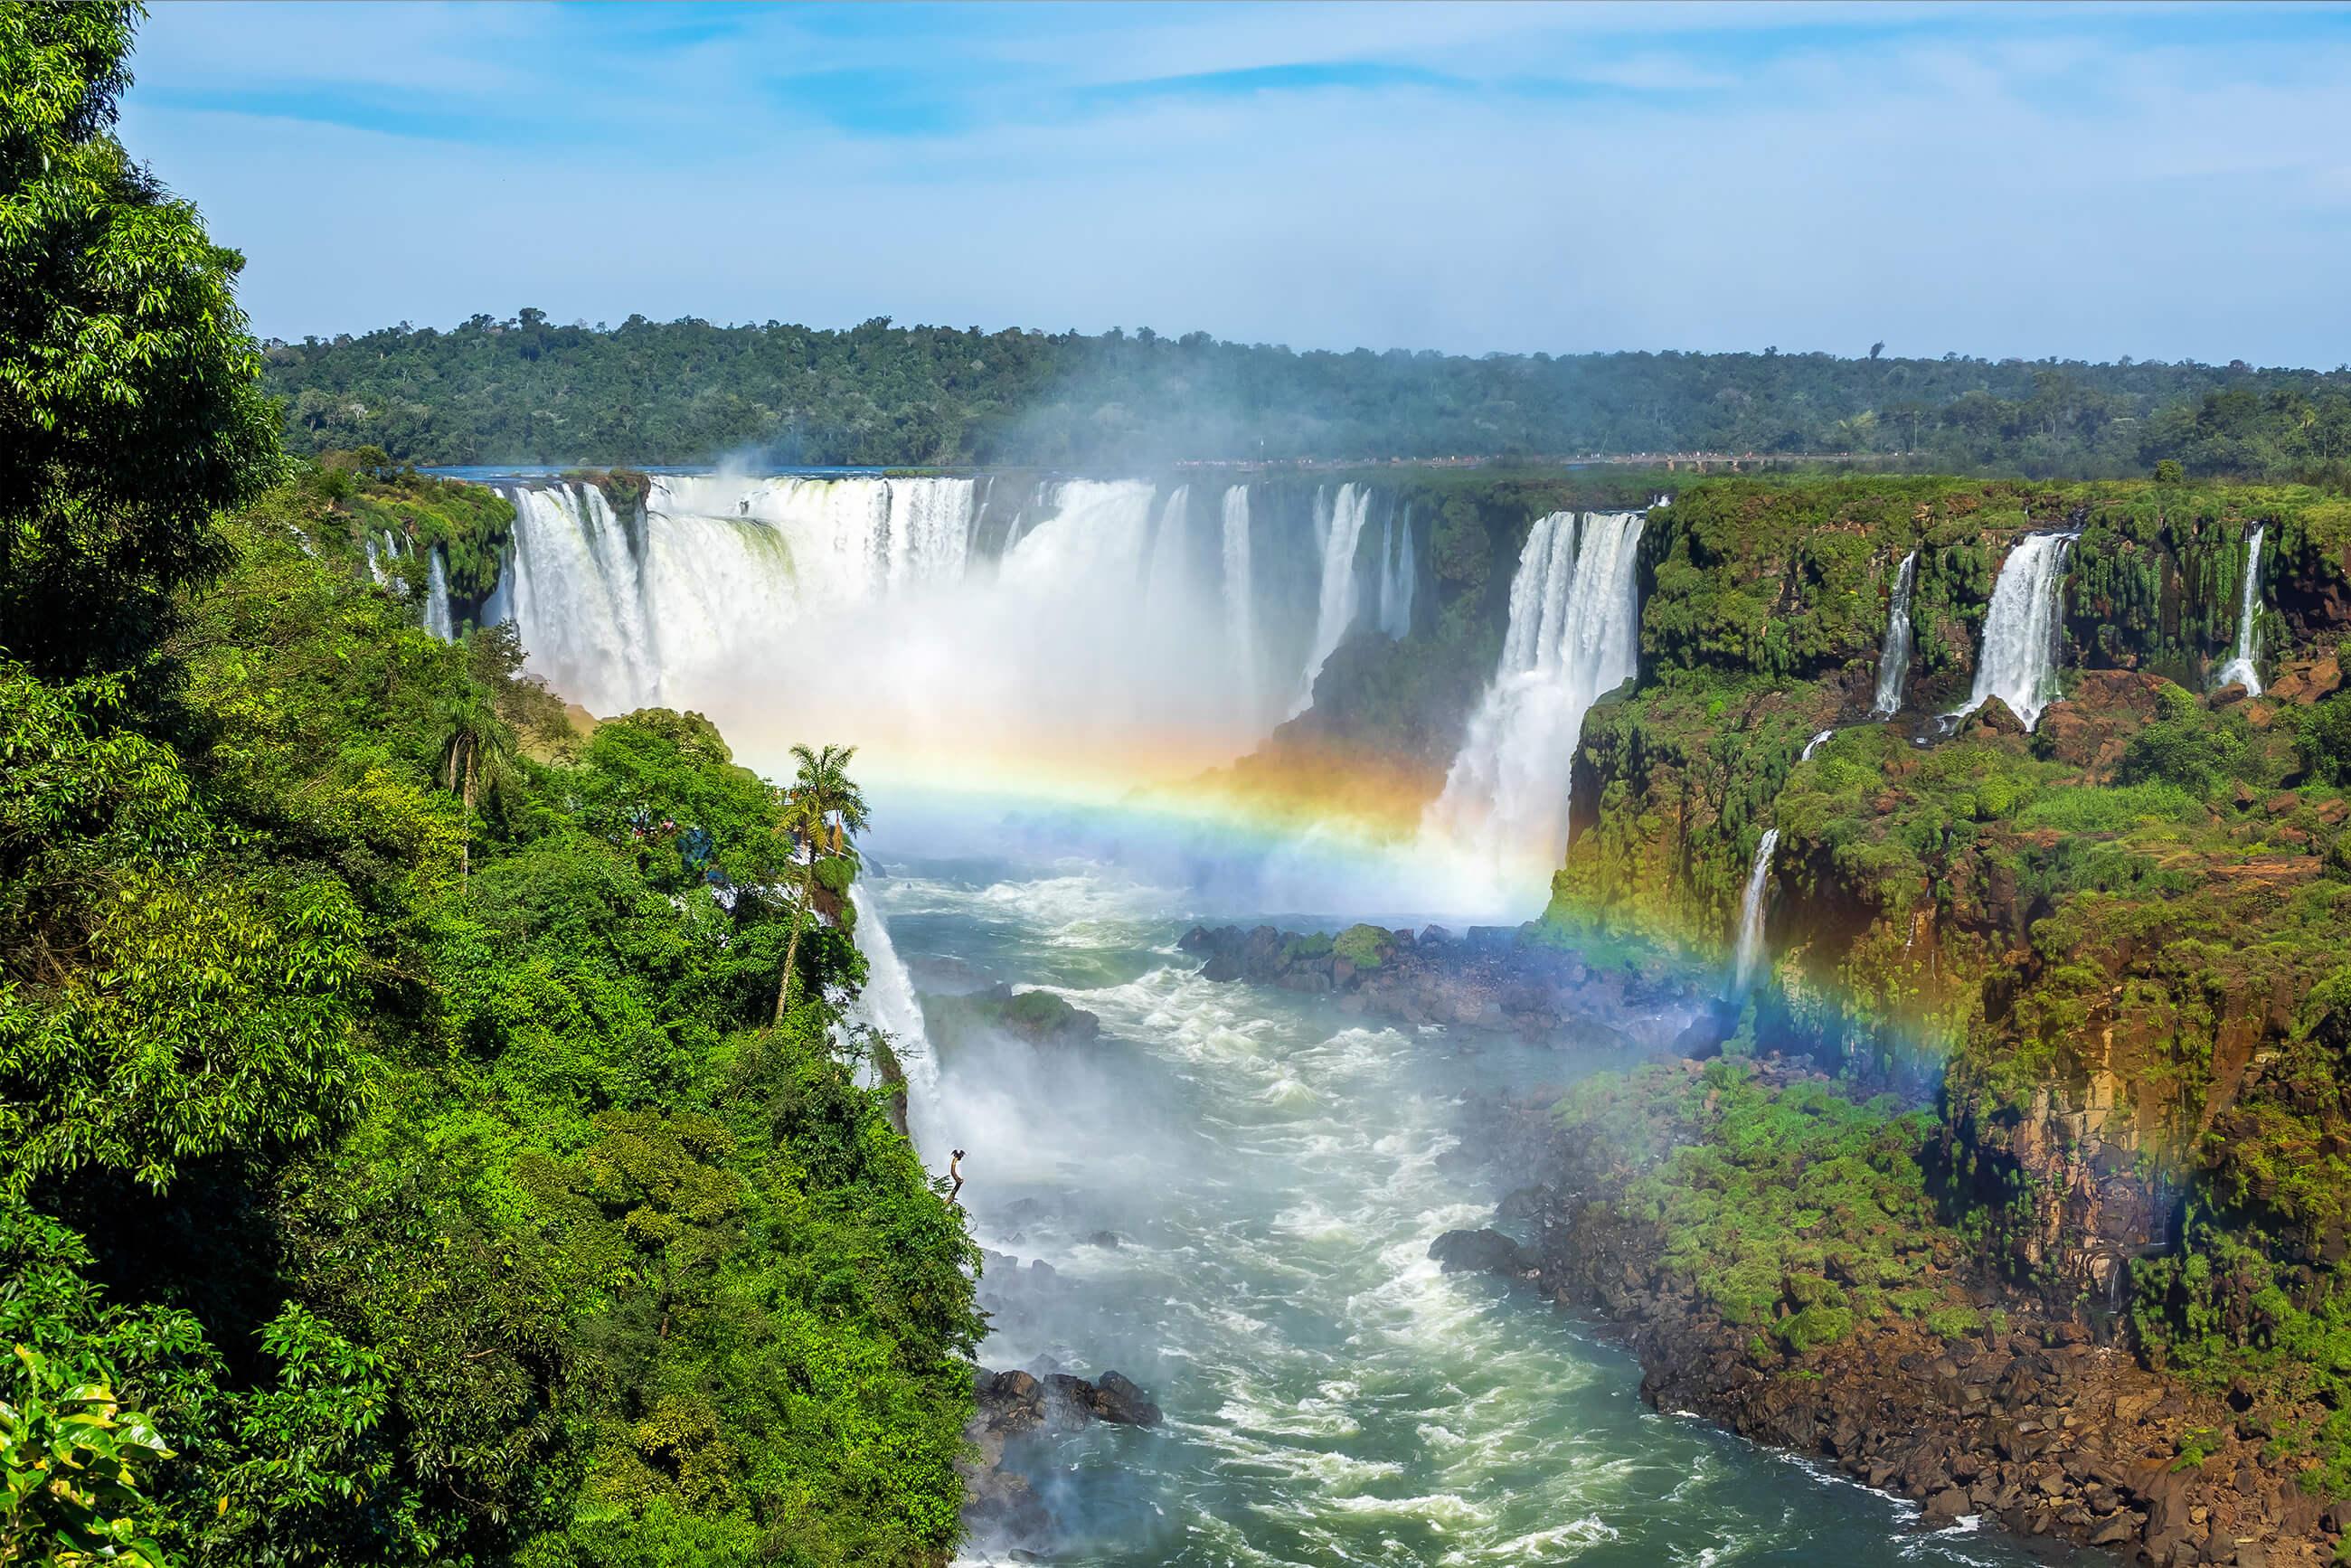 https://bubo.sk/uploads/galleries/5016/shutterstock_argentina_brazilia_iguazu_315284633-1-.jpg